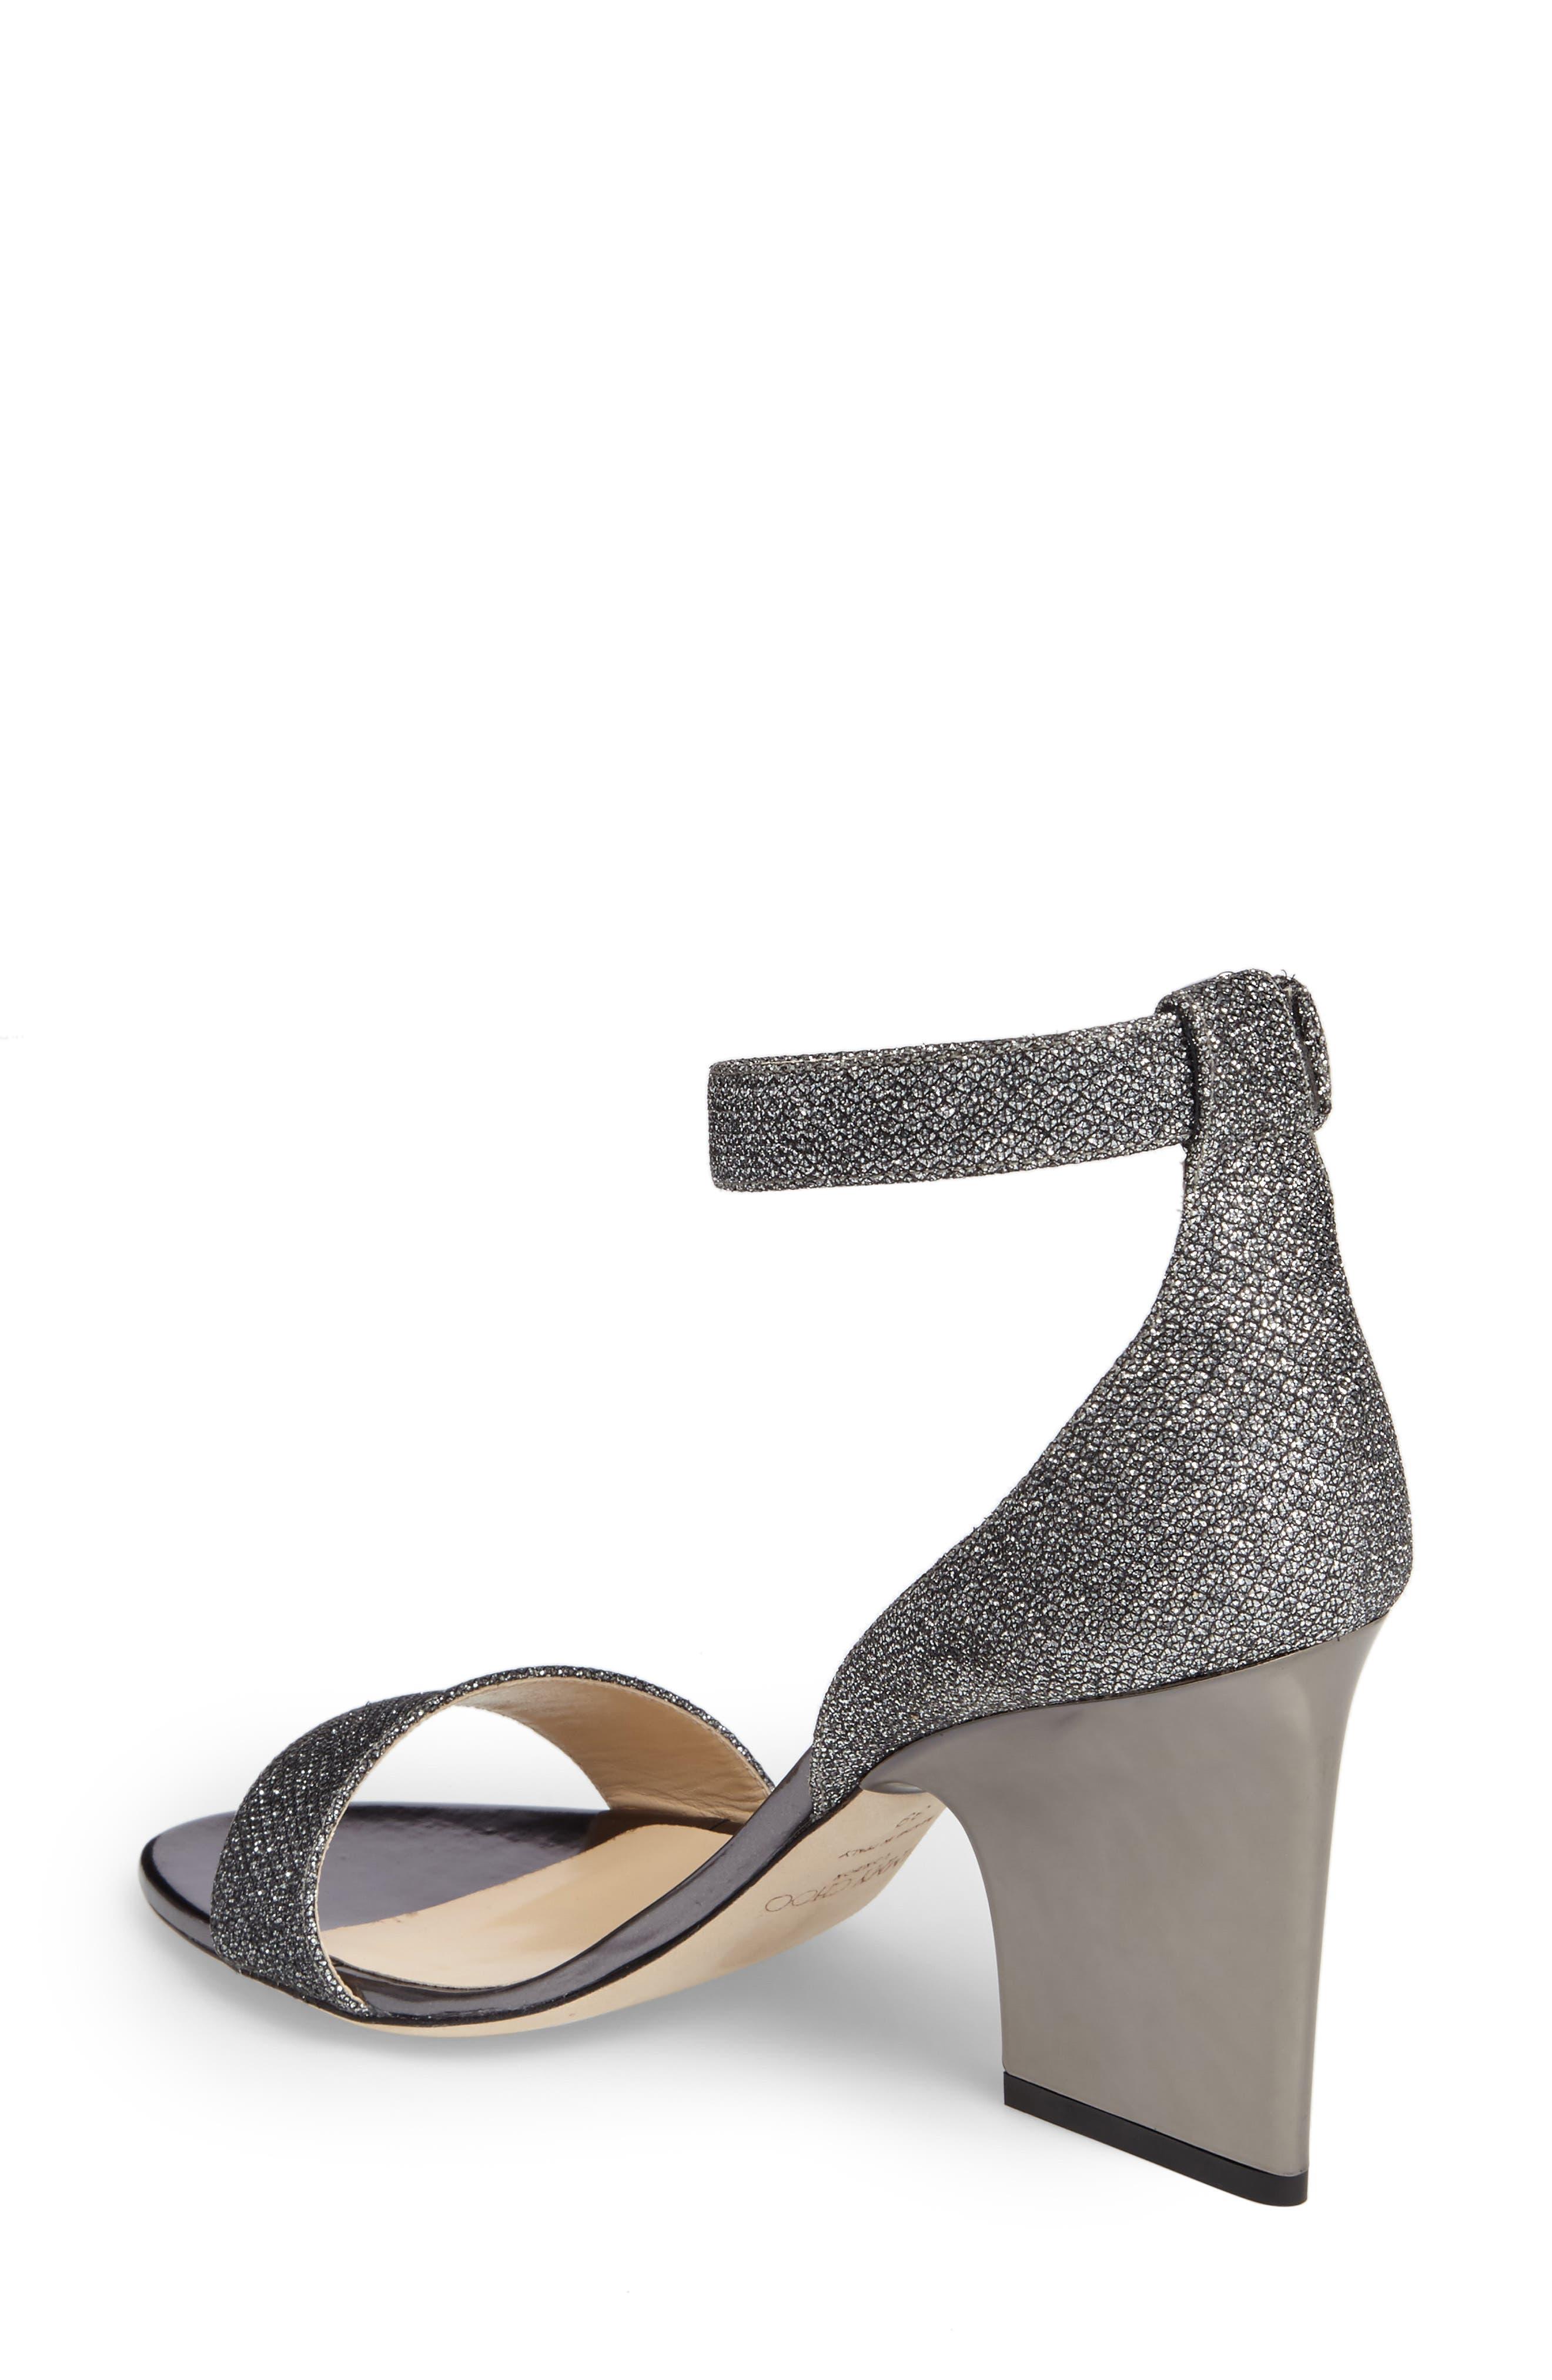 Edina Ankle Strap Sandal,                             Alternate thumbnail 2, color,                             Anthracite